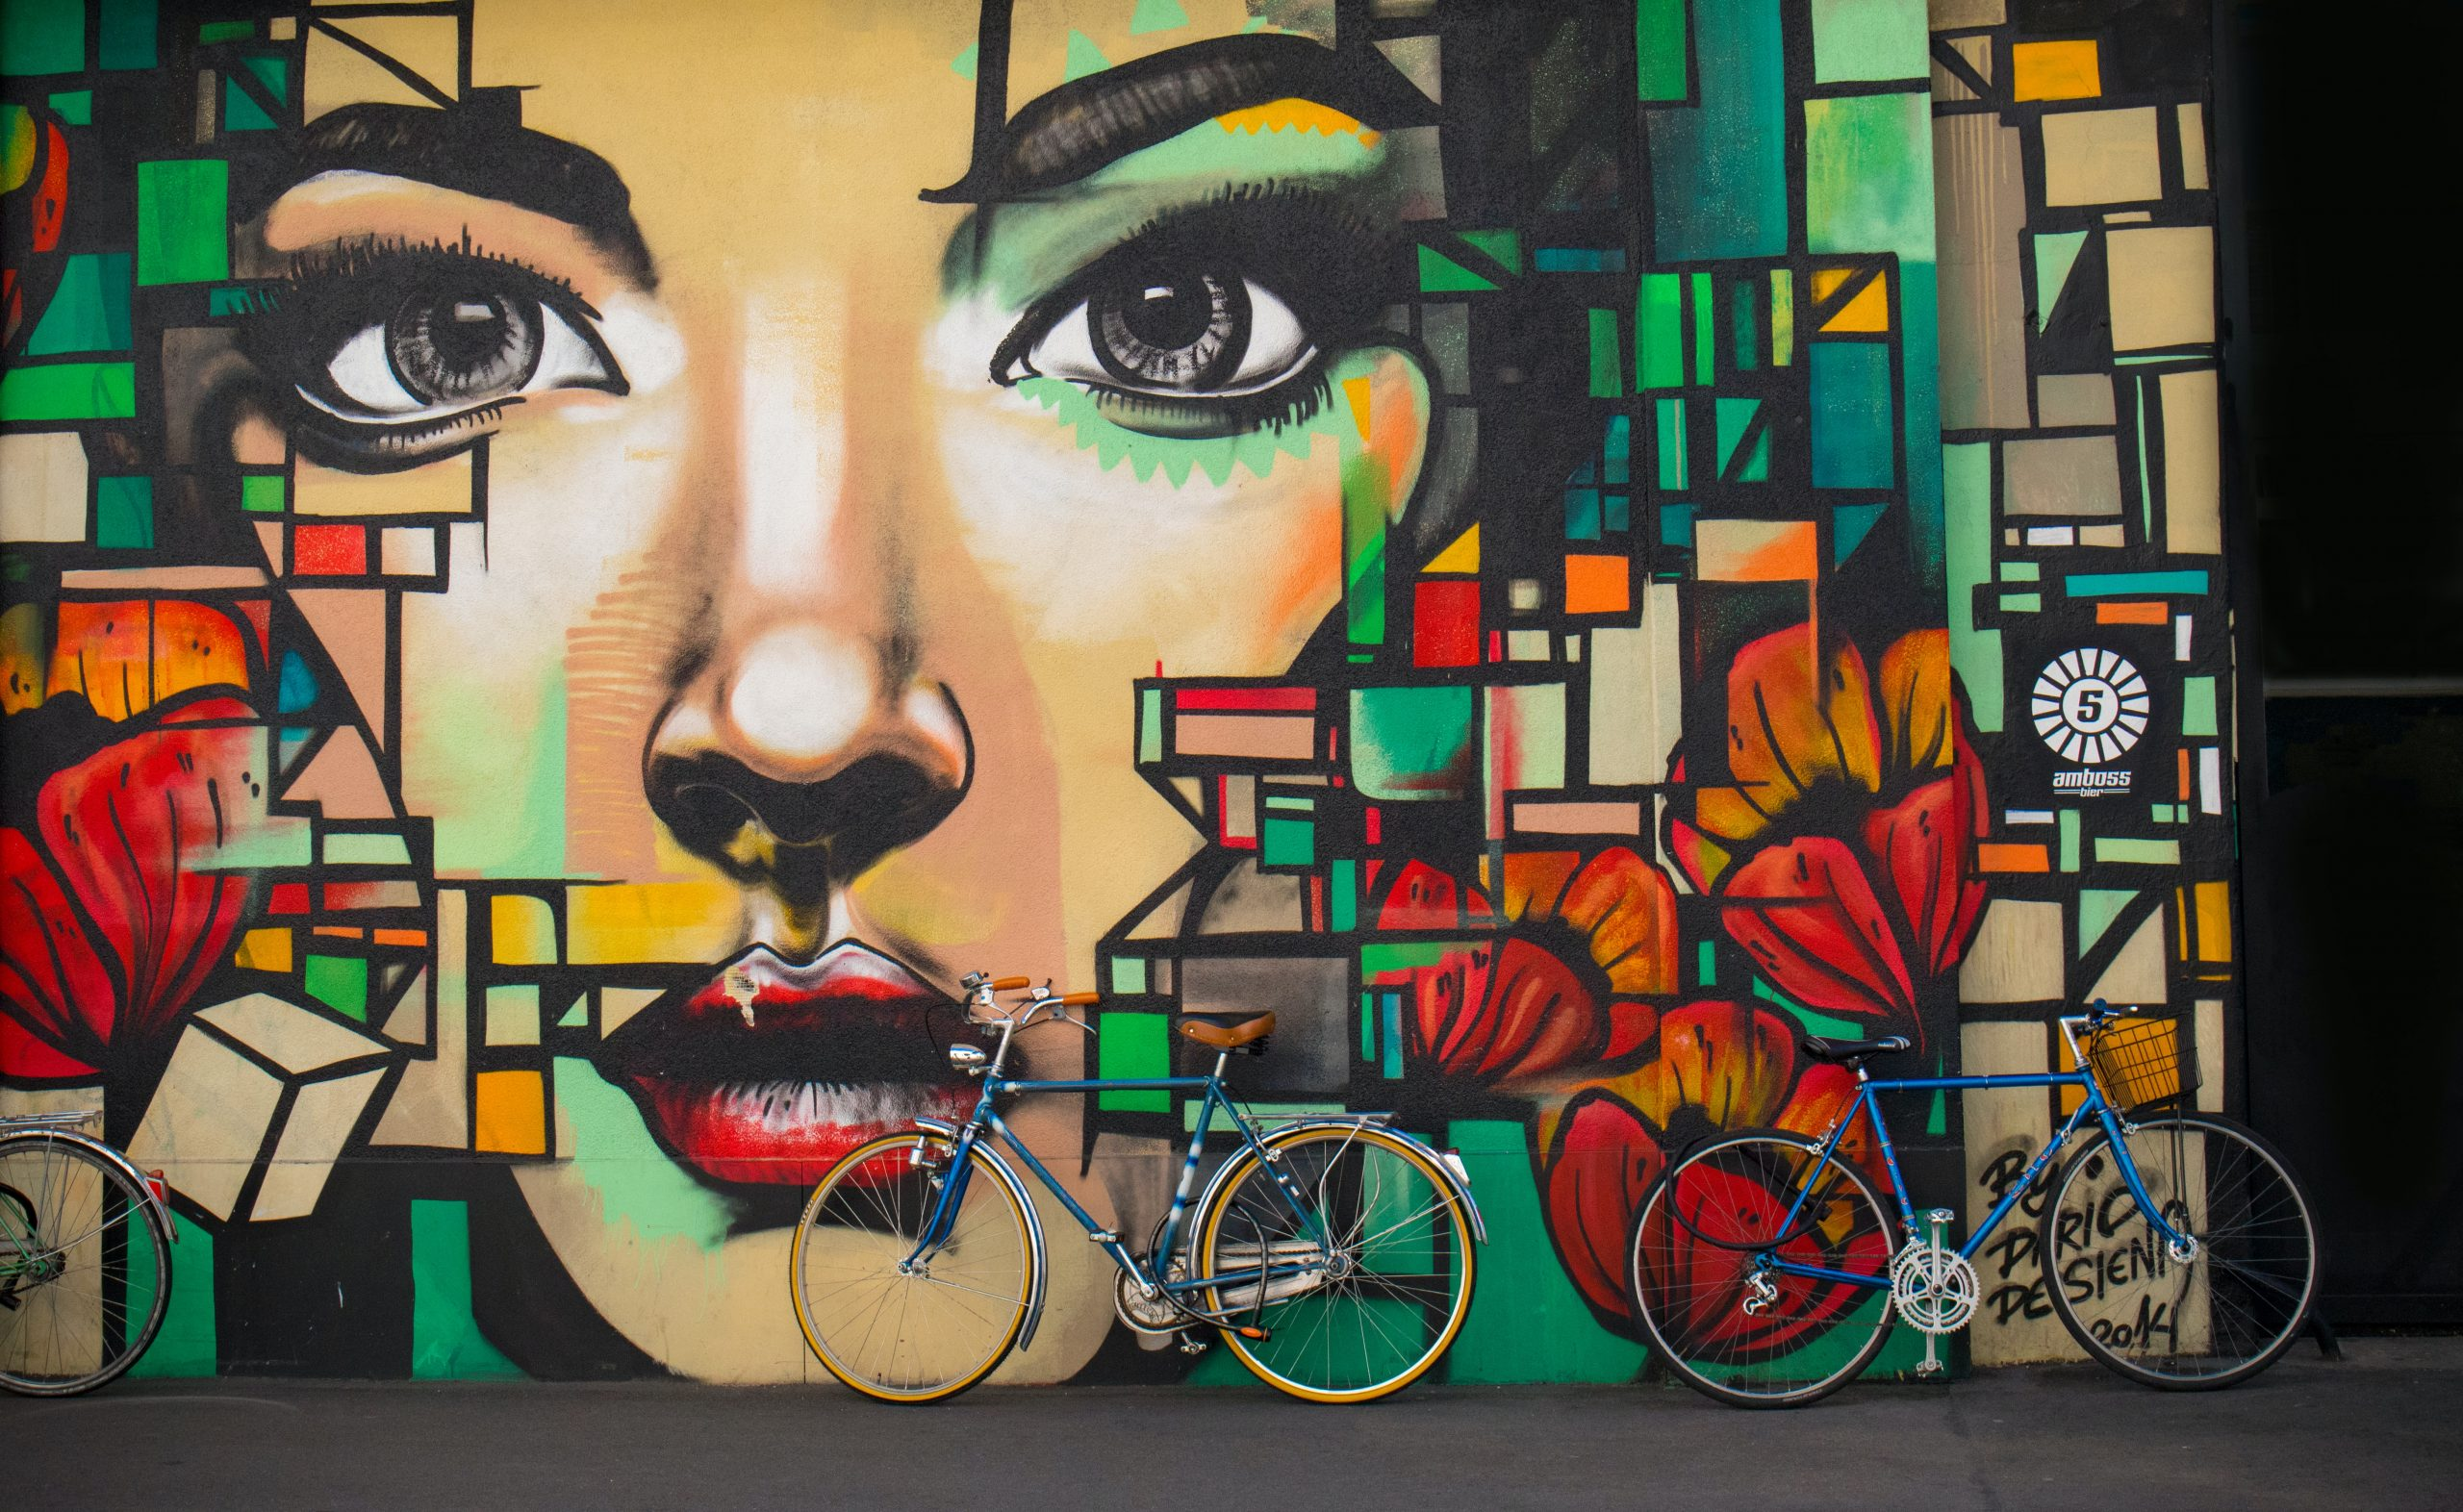 Bikes lean against wall painting